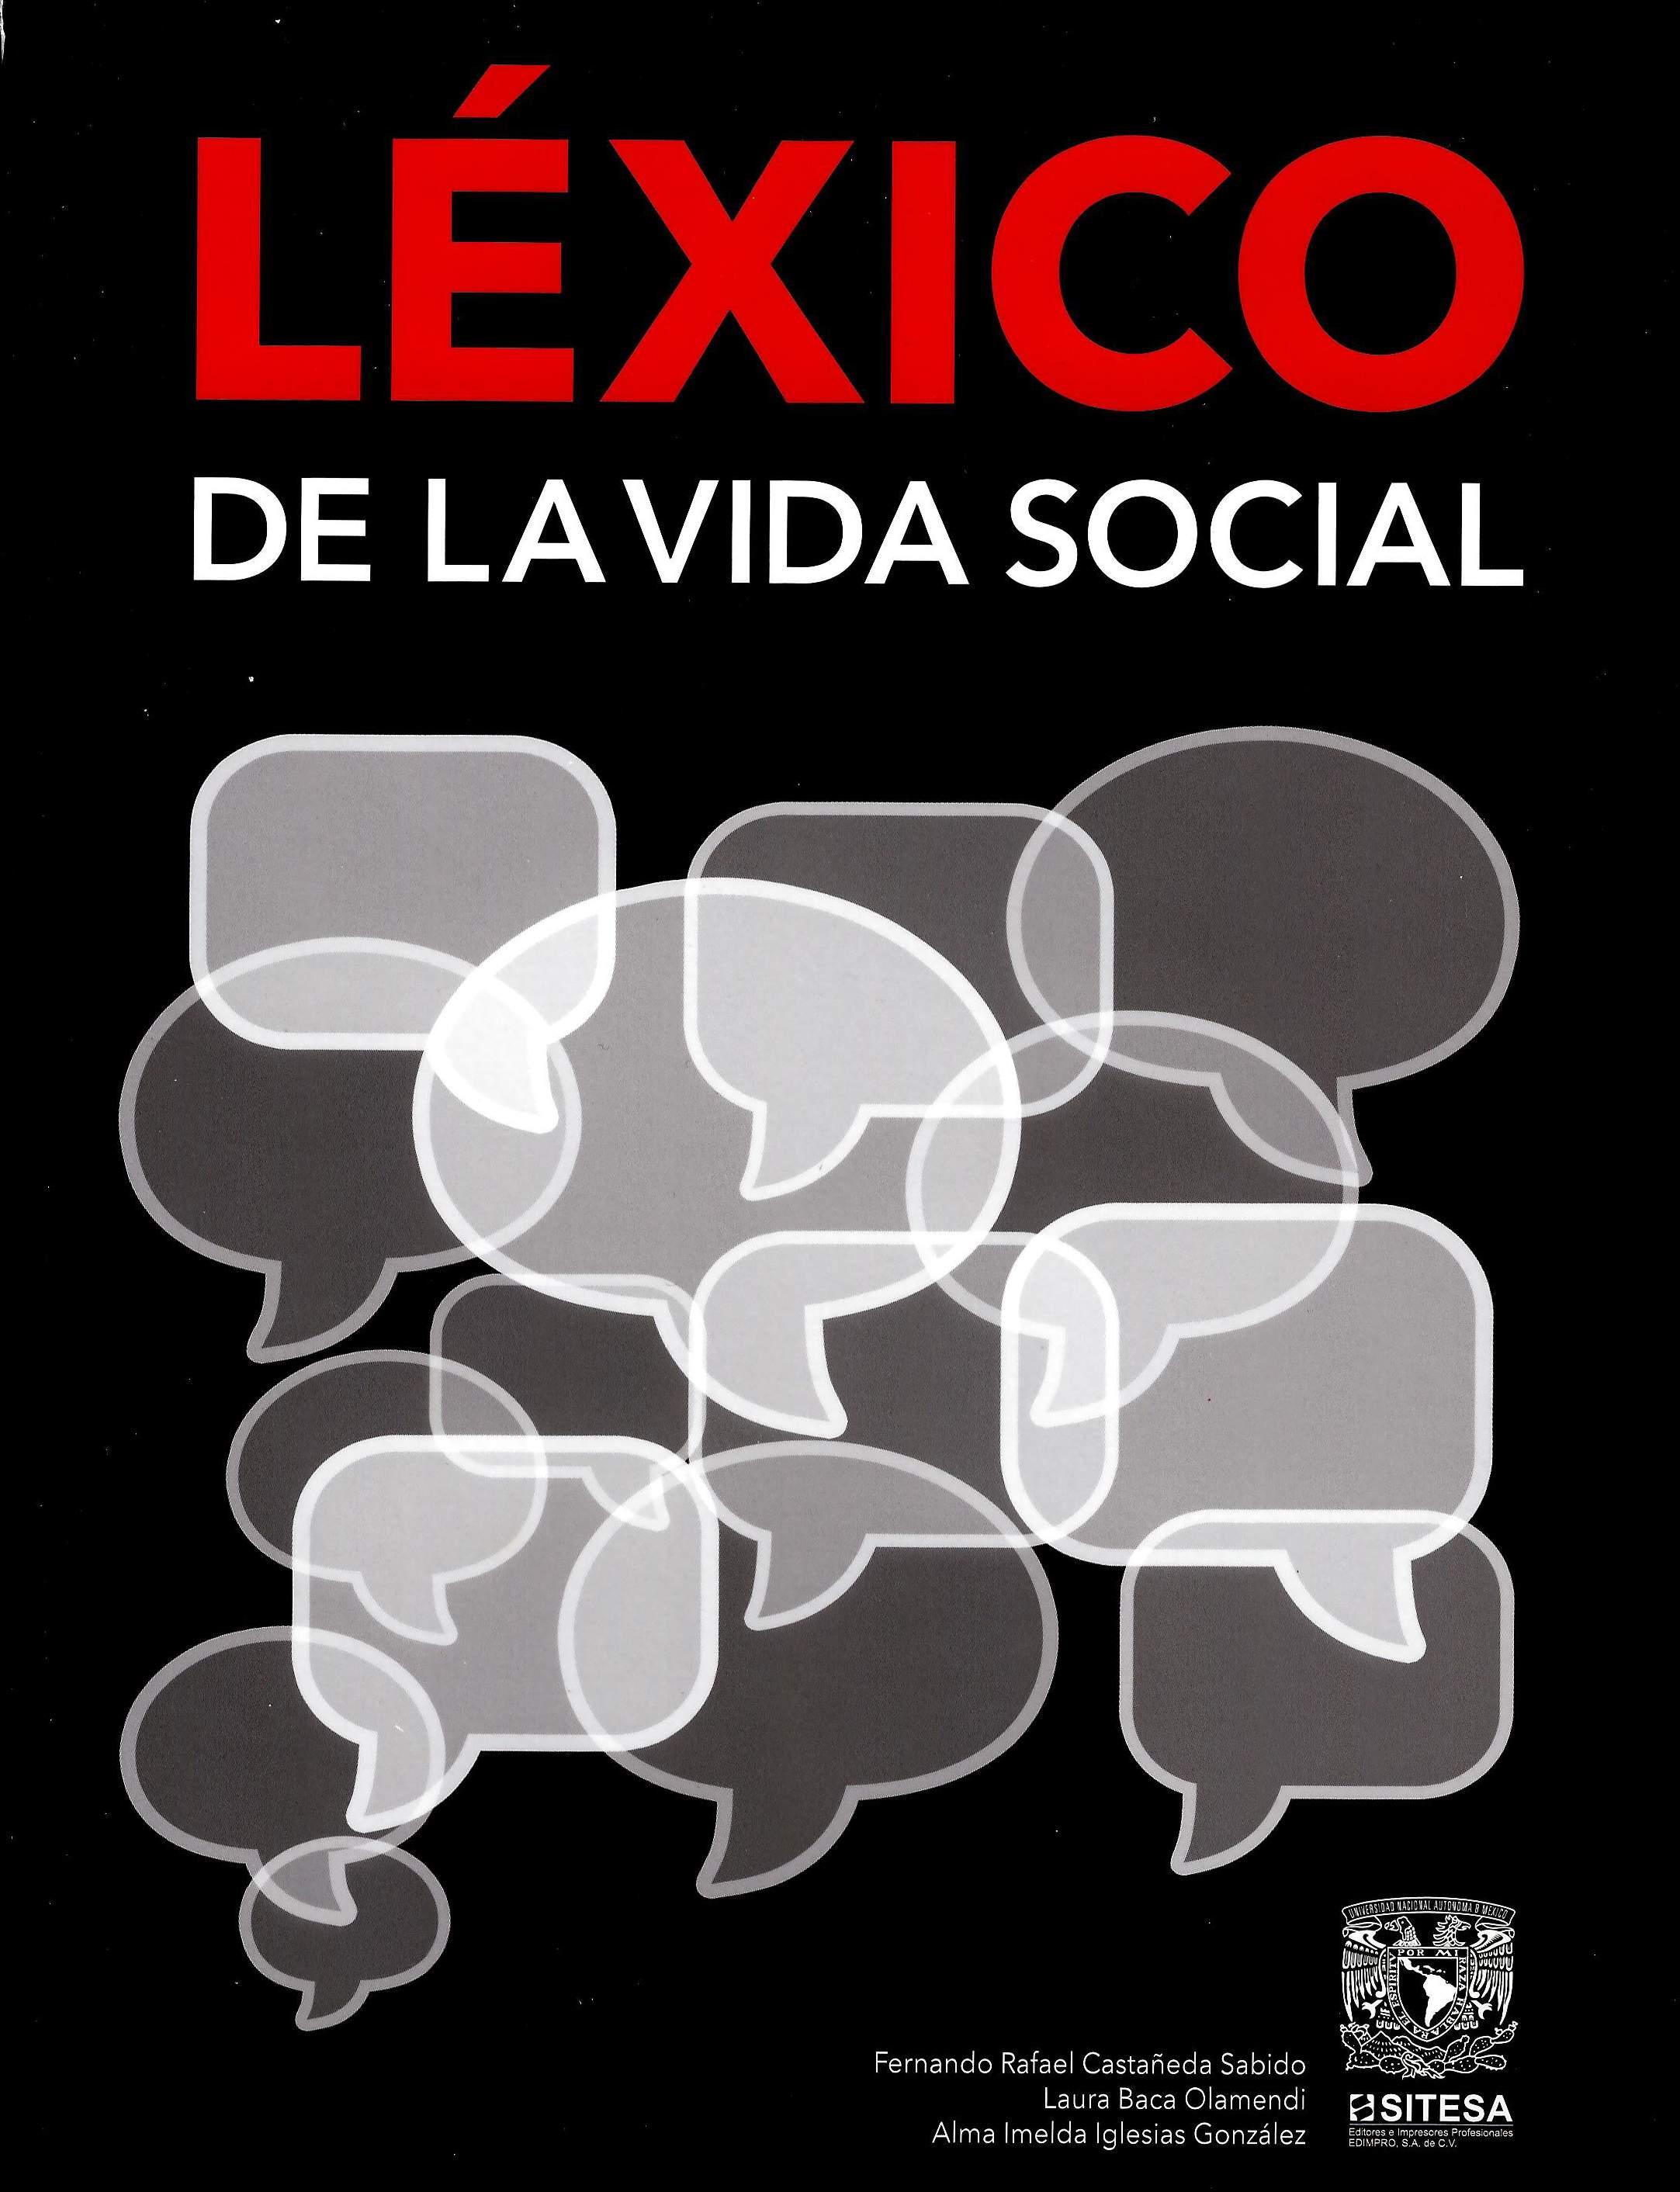 Léxico de la vida social